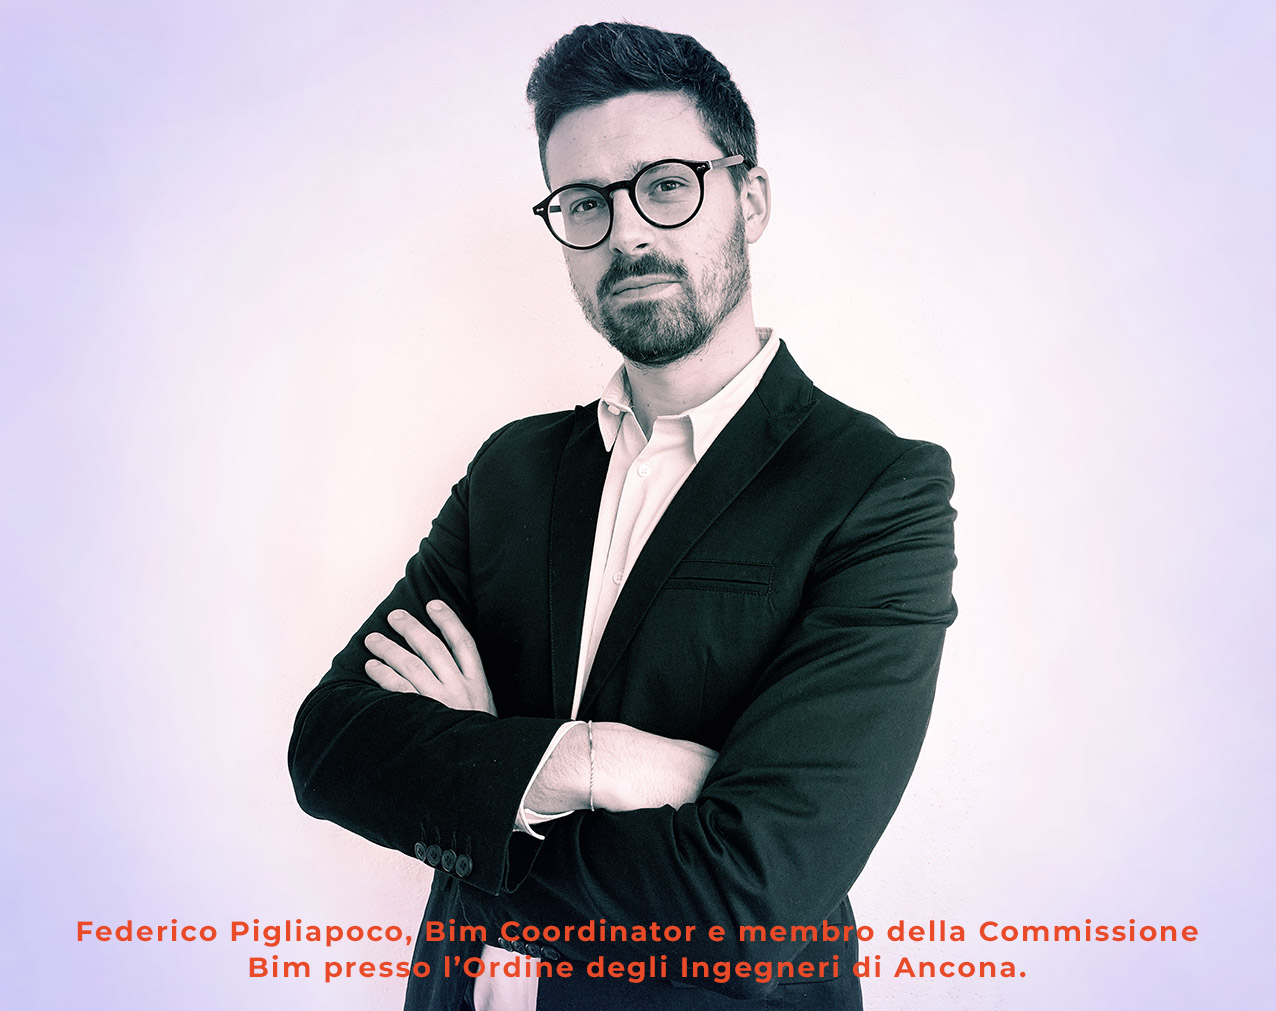 Federico_Pigliapoco rosso